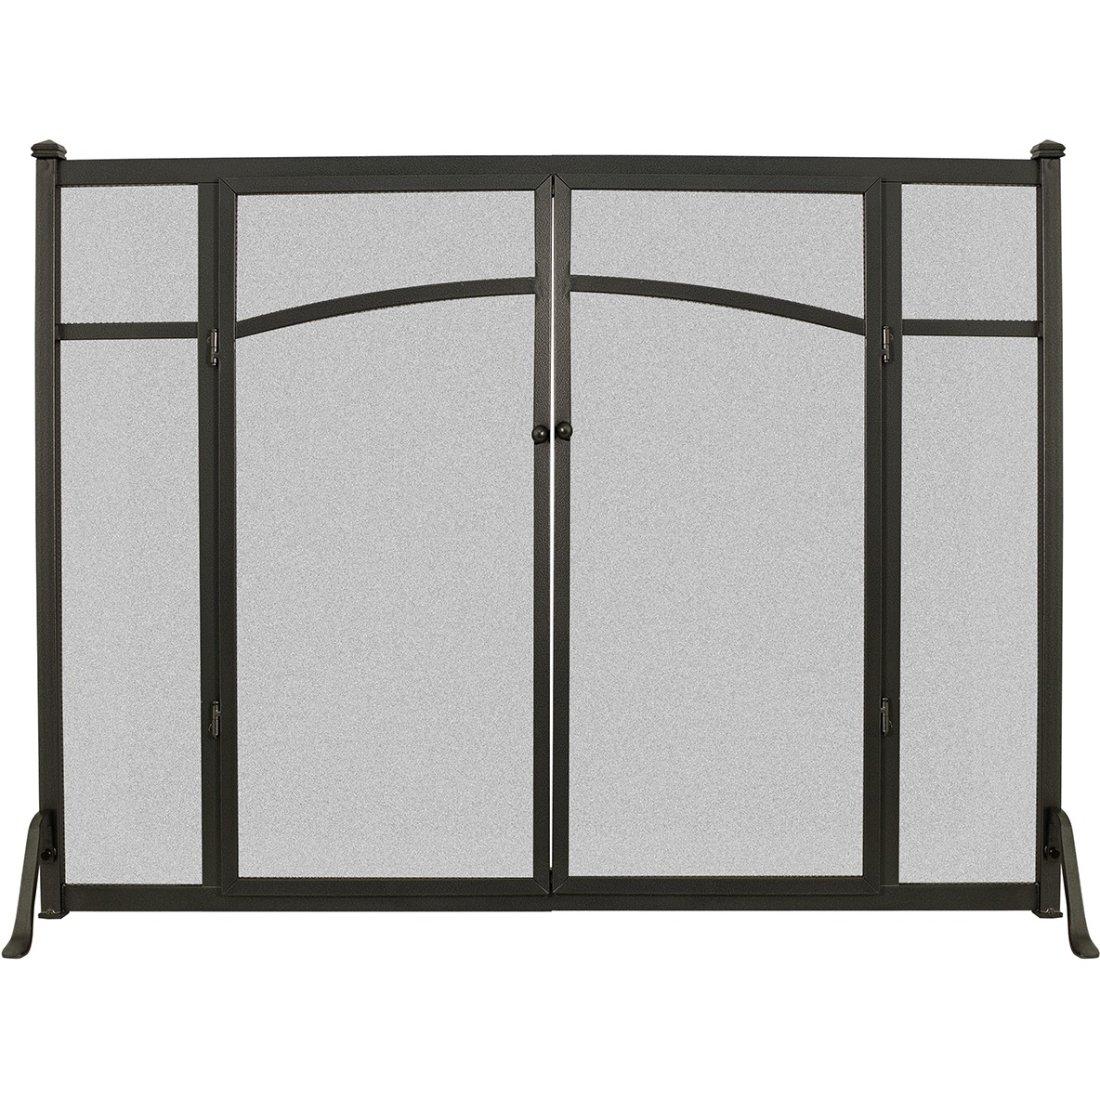 amazon com panacea flat panel screen with doors 31